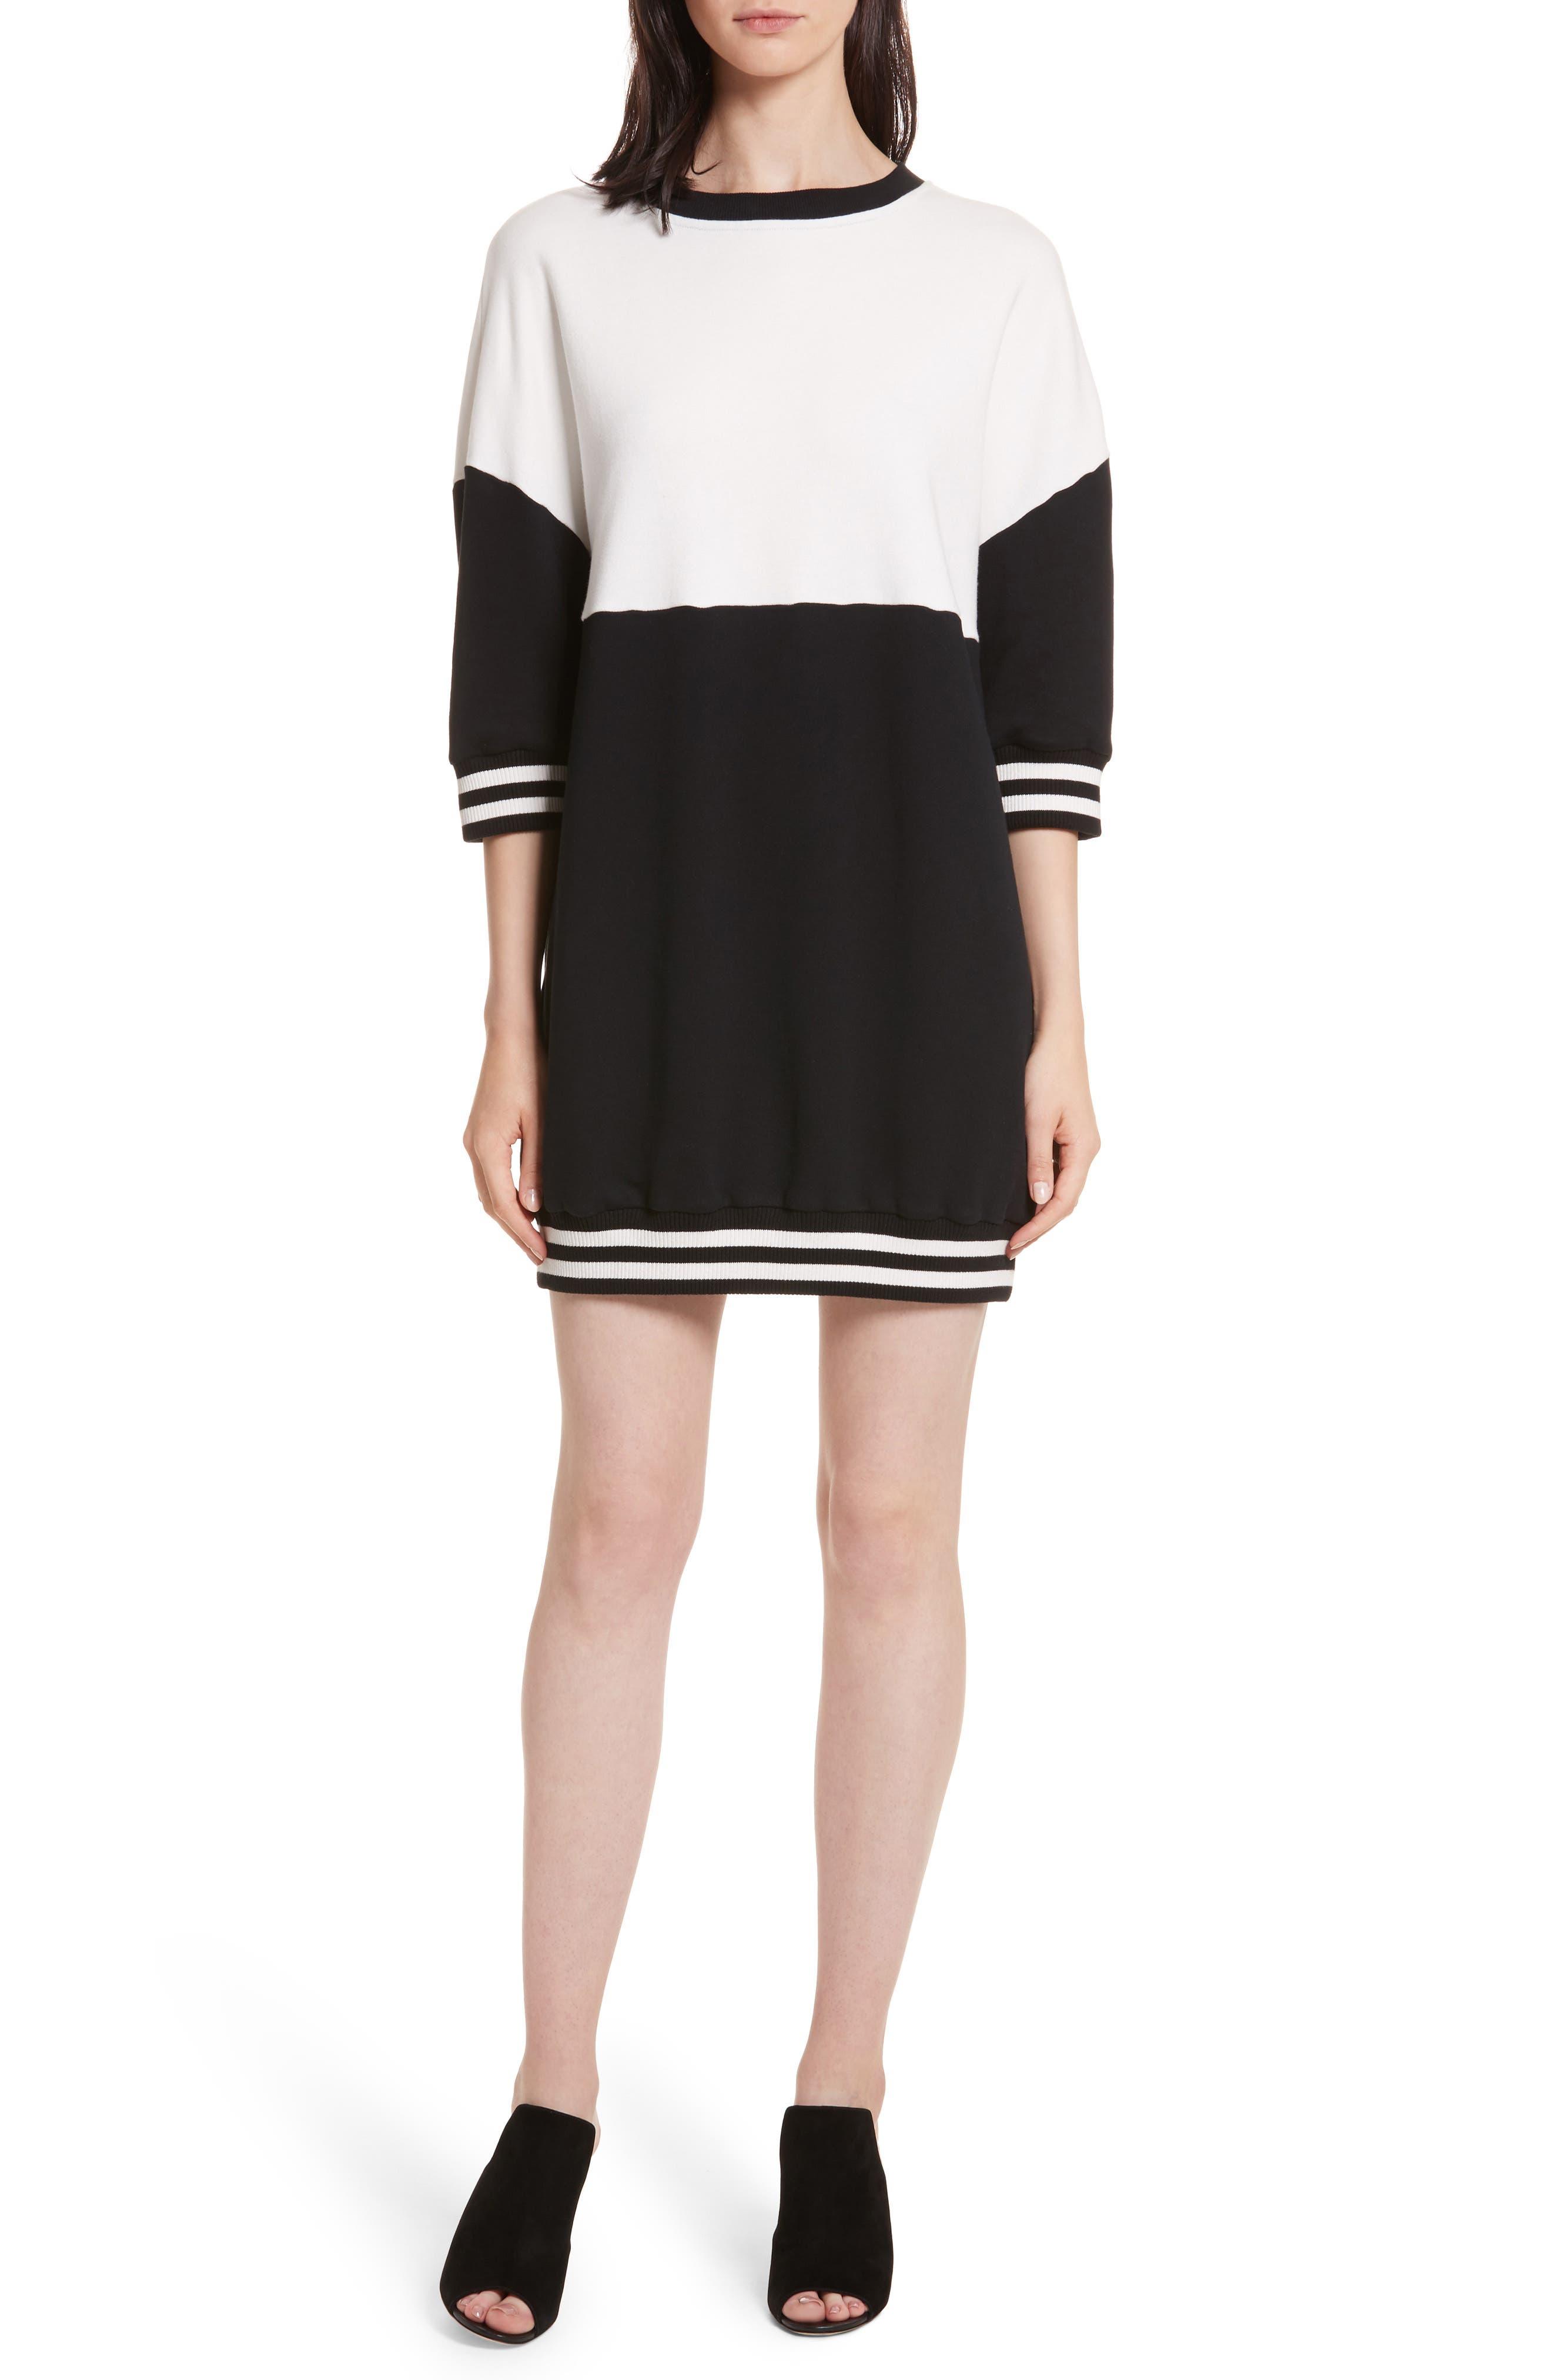 Gussie Colorblock Sweatshirt Dress,                         Main,                         color, Black/ Off White